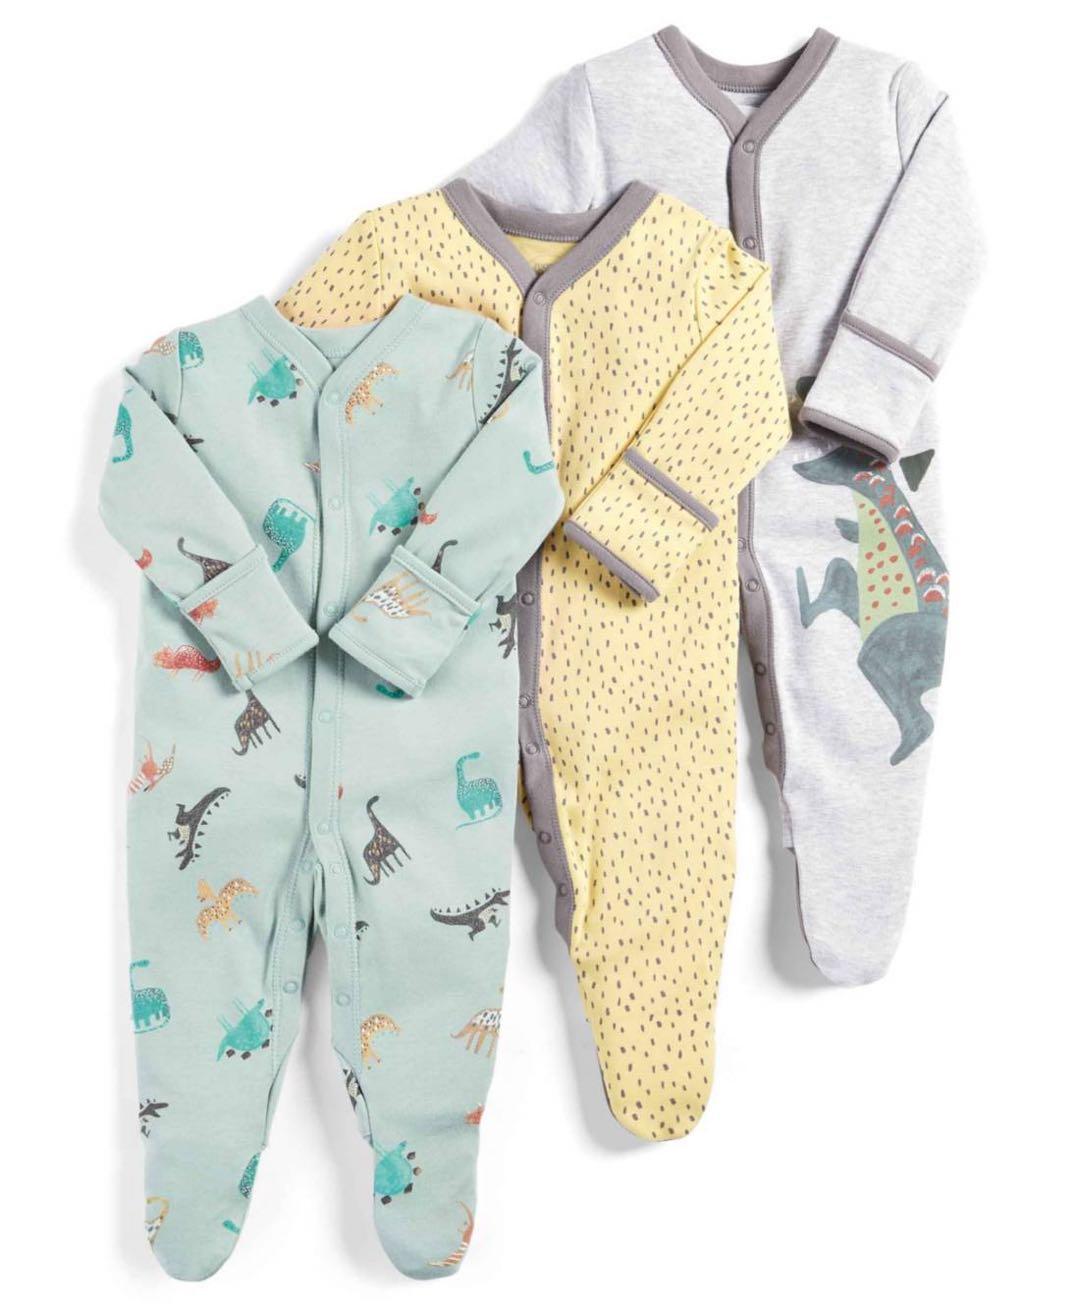 HTB1.XzoXXY7gK0jSZKzq6yikpXaz Baby Girl Romper Newborn Sleepsuit Flower Baby Rompers 2019 Infant Baby Clothes Long Sleeve Newborn Jumpsuits Baby Boy Pajamas